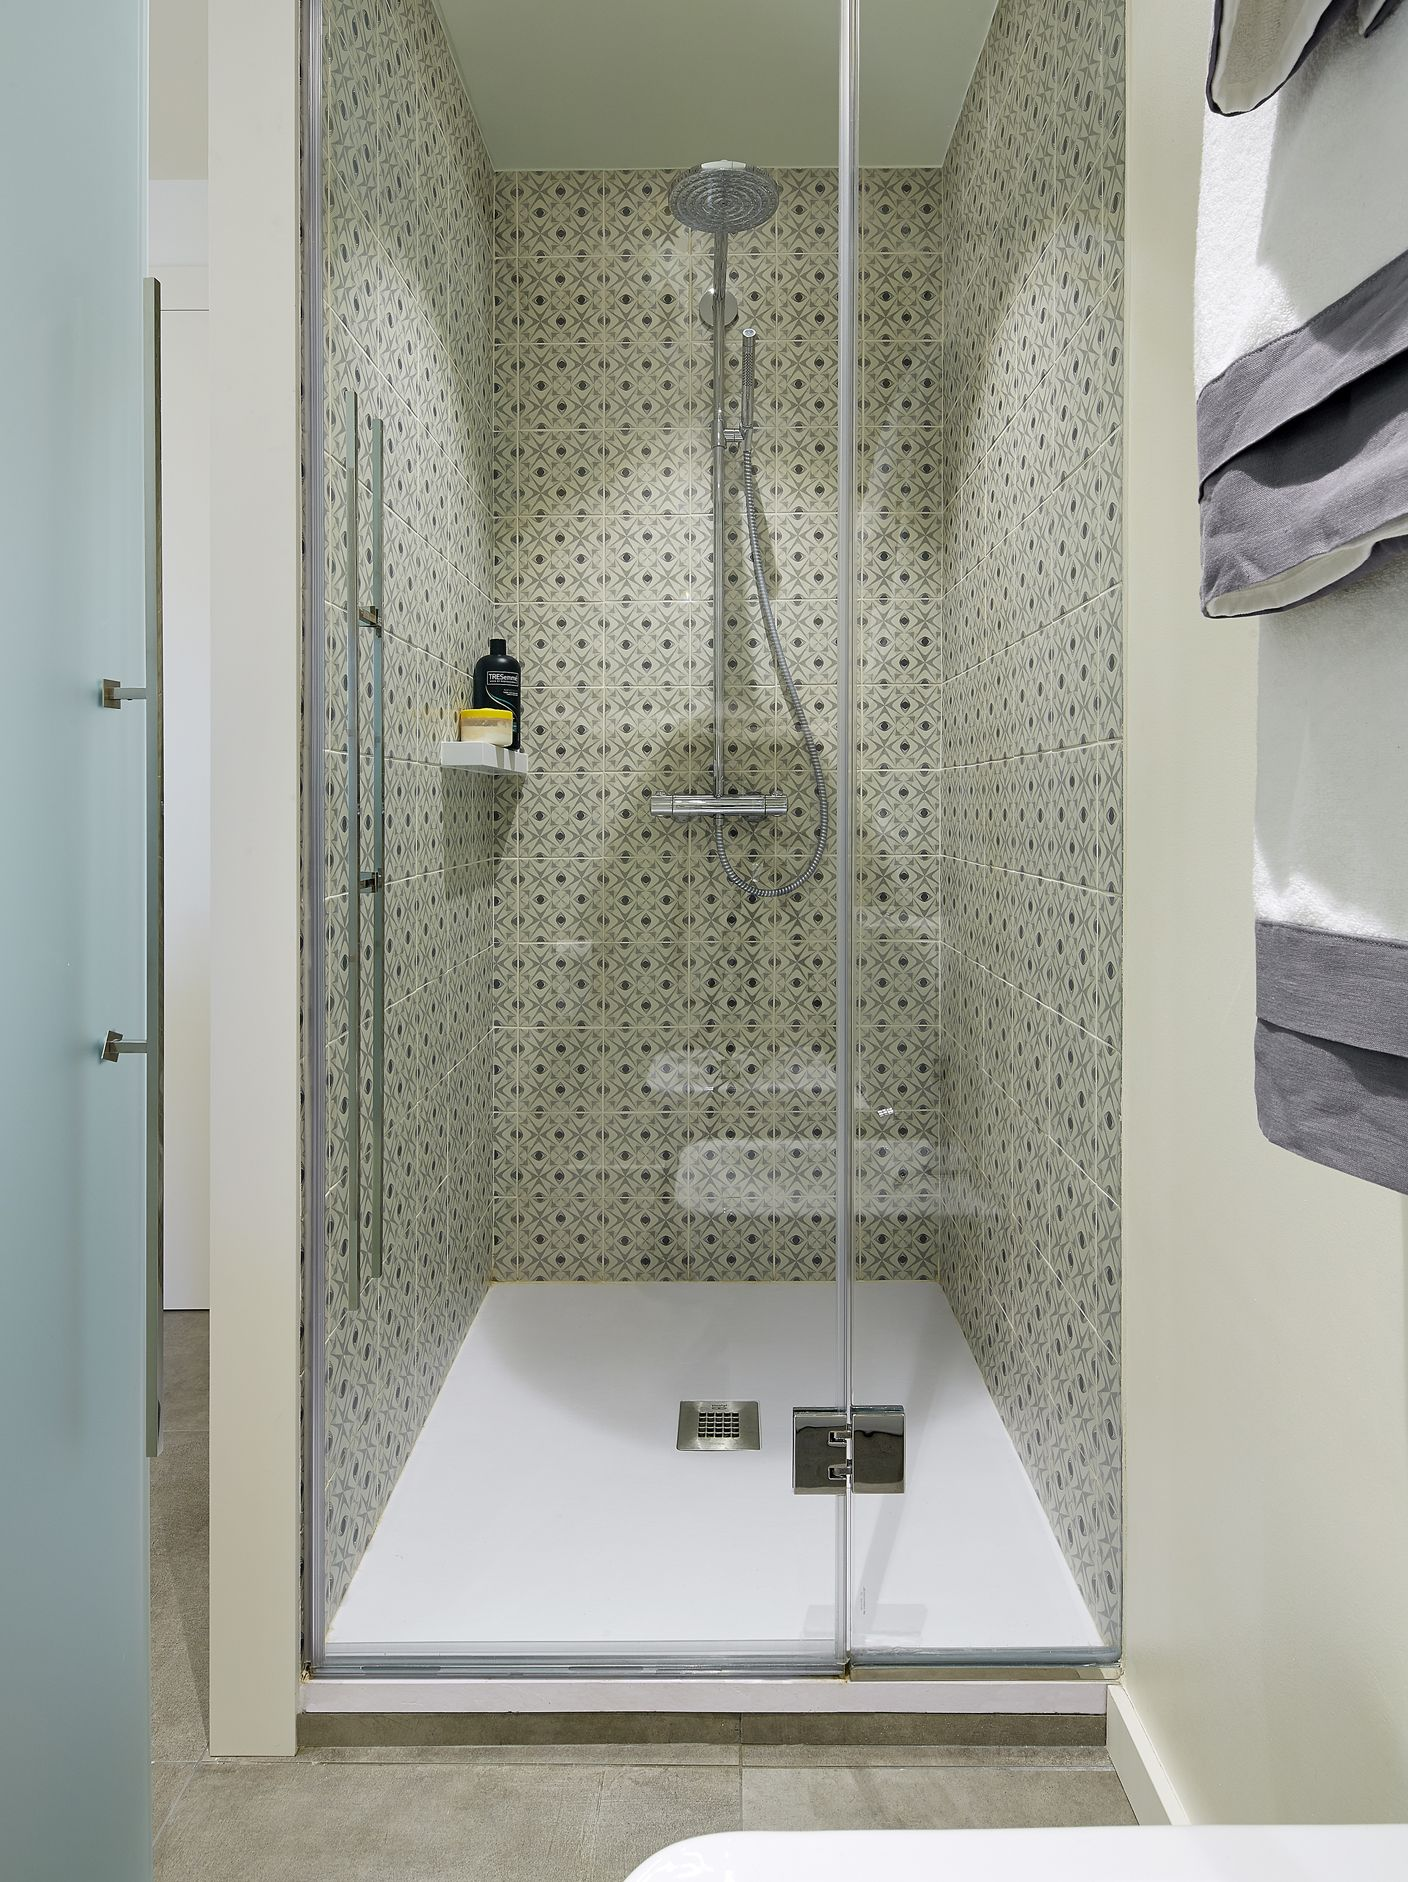 Molins Interiors Arquitectura Interior Interiorismo - Decoracion-baos-con-plato-de-ducha